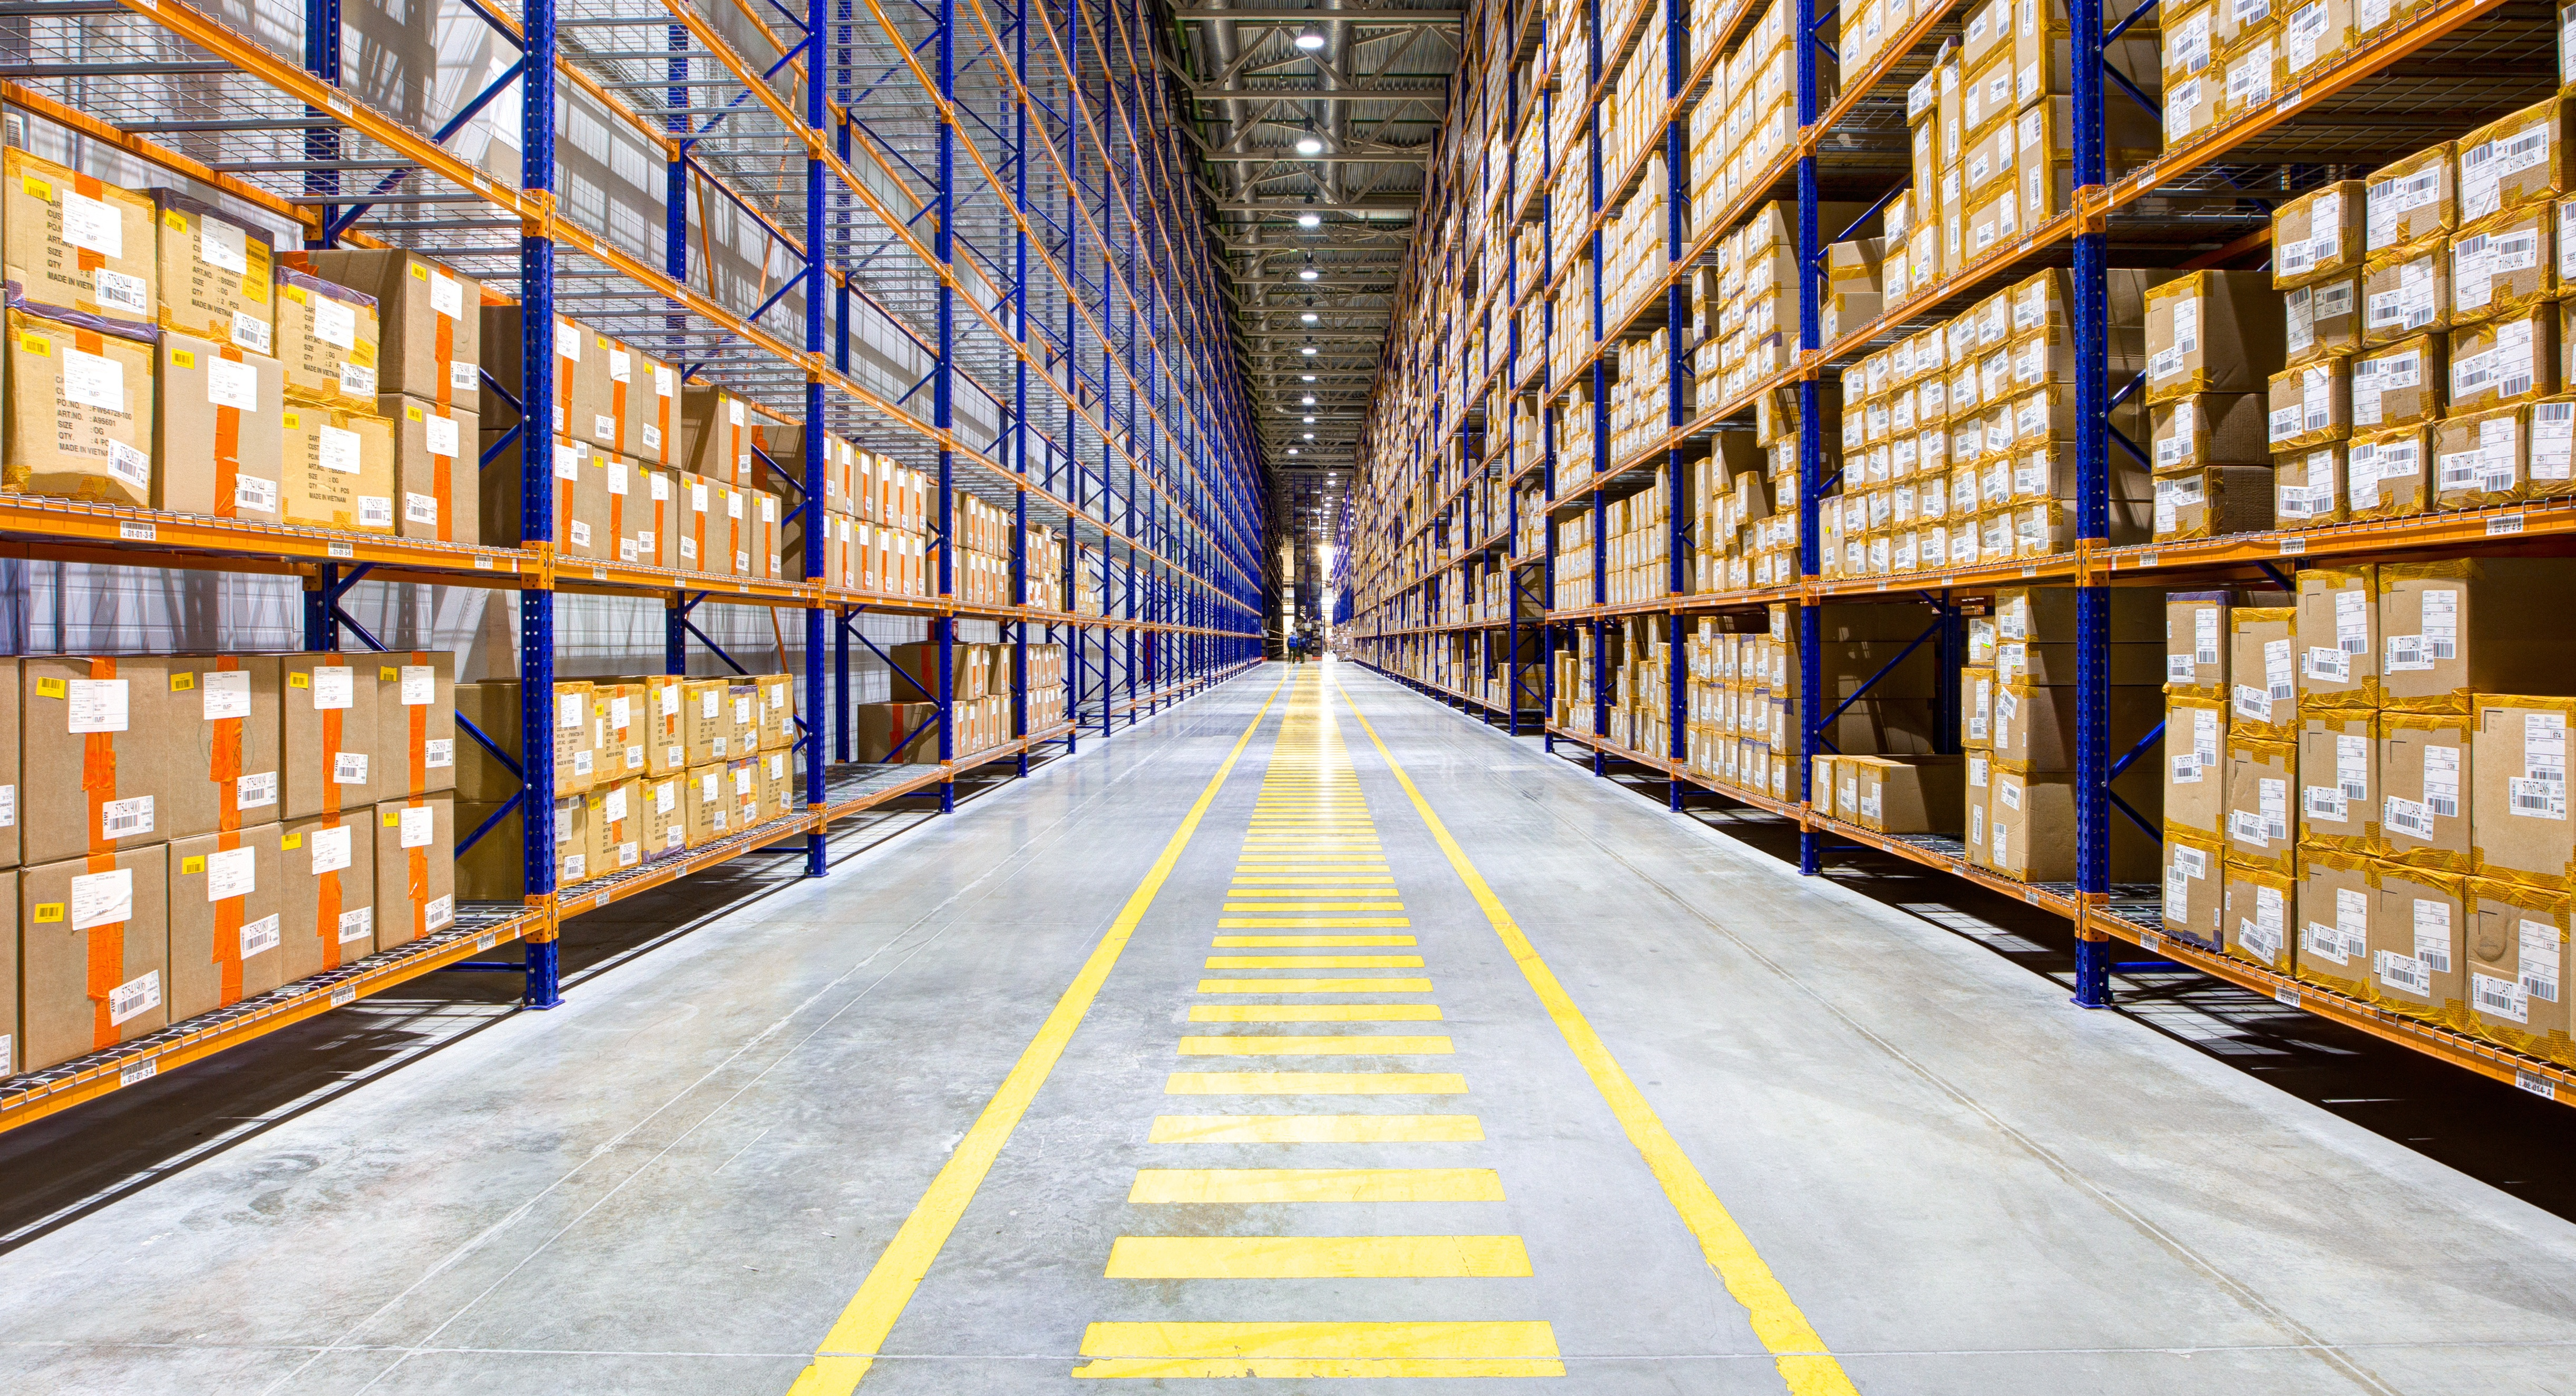 large-warehouse-interior-1